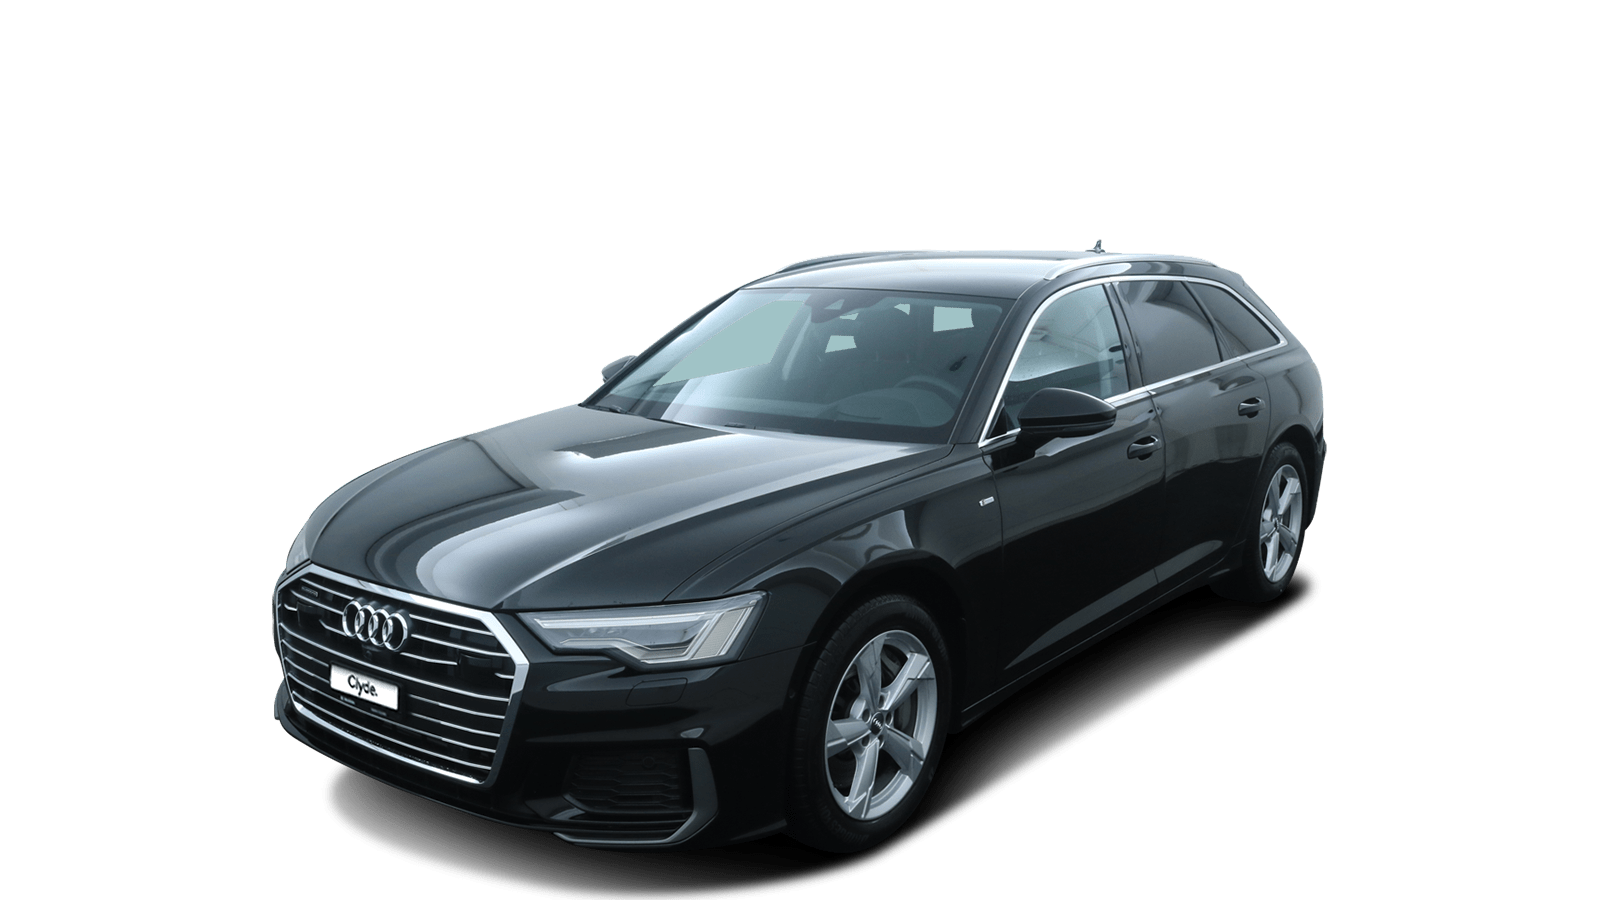 Audi A6 Avant Black front - Clyde car subscription